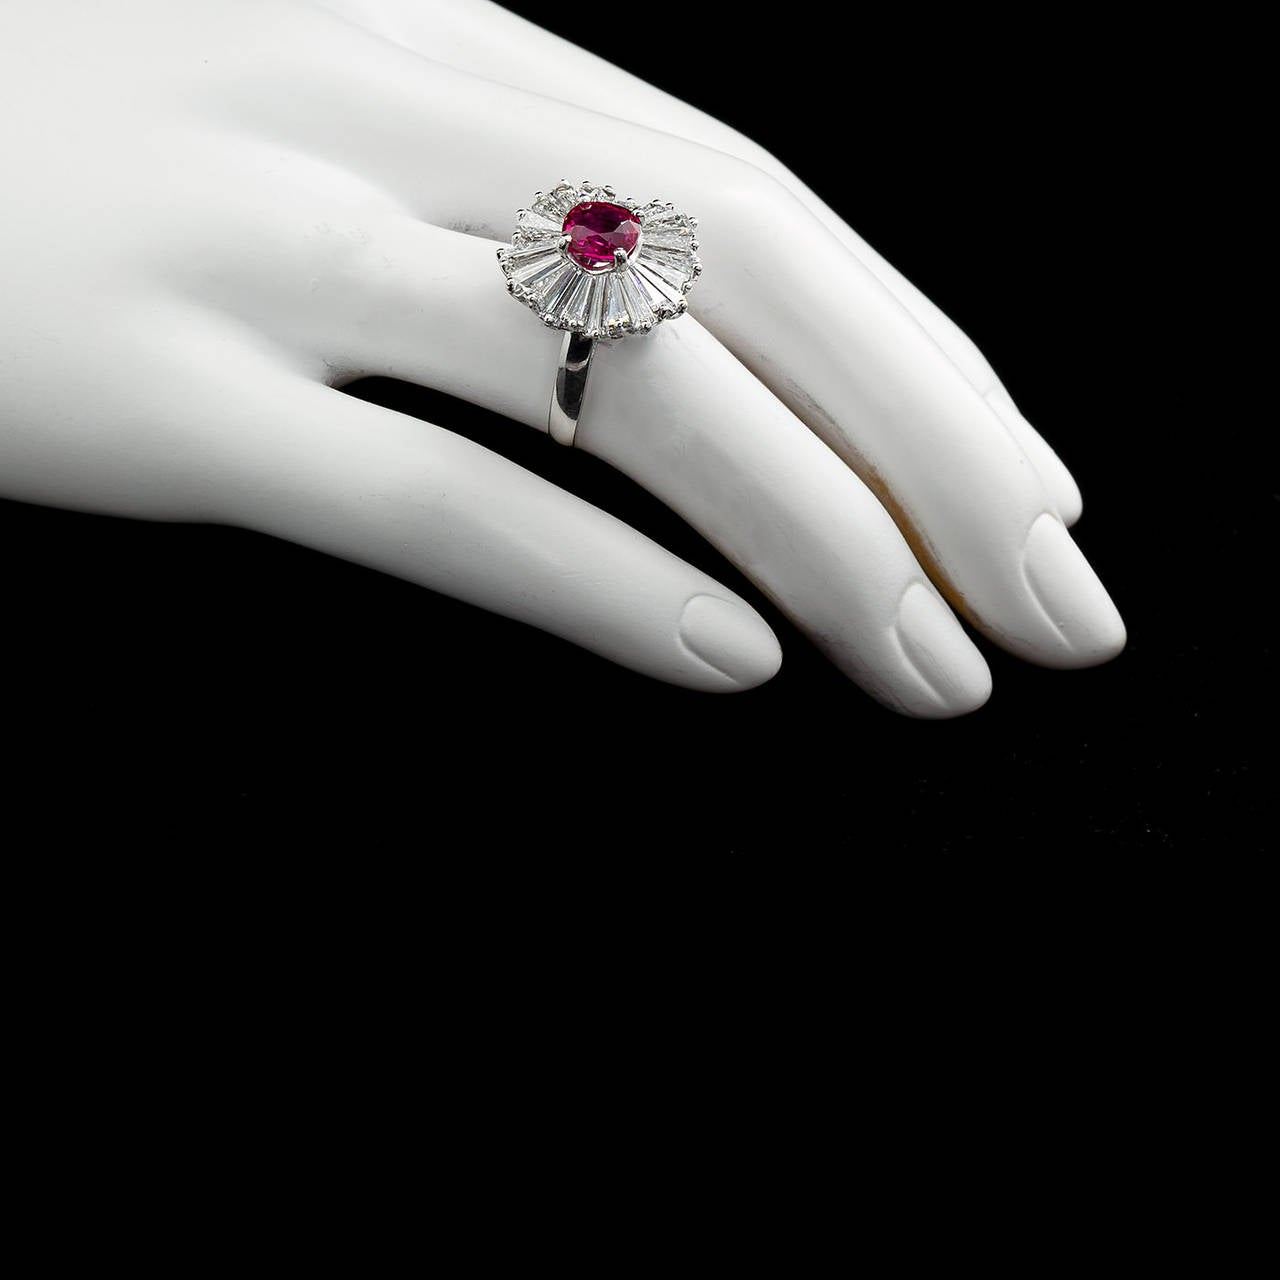 Cushion Cut Ruby Diamond Ballerina Ring 1.86 Carat  For Sale 1